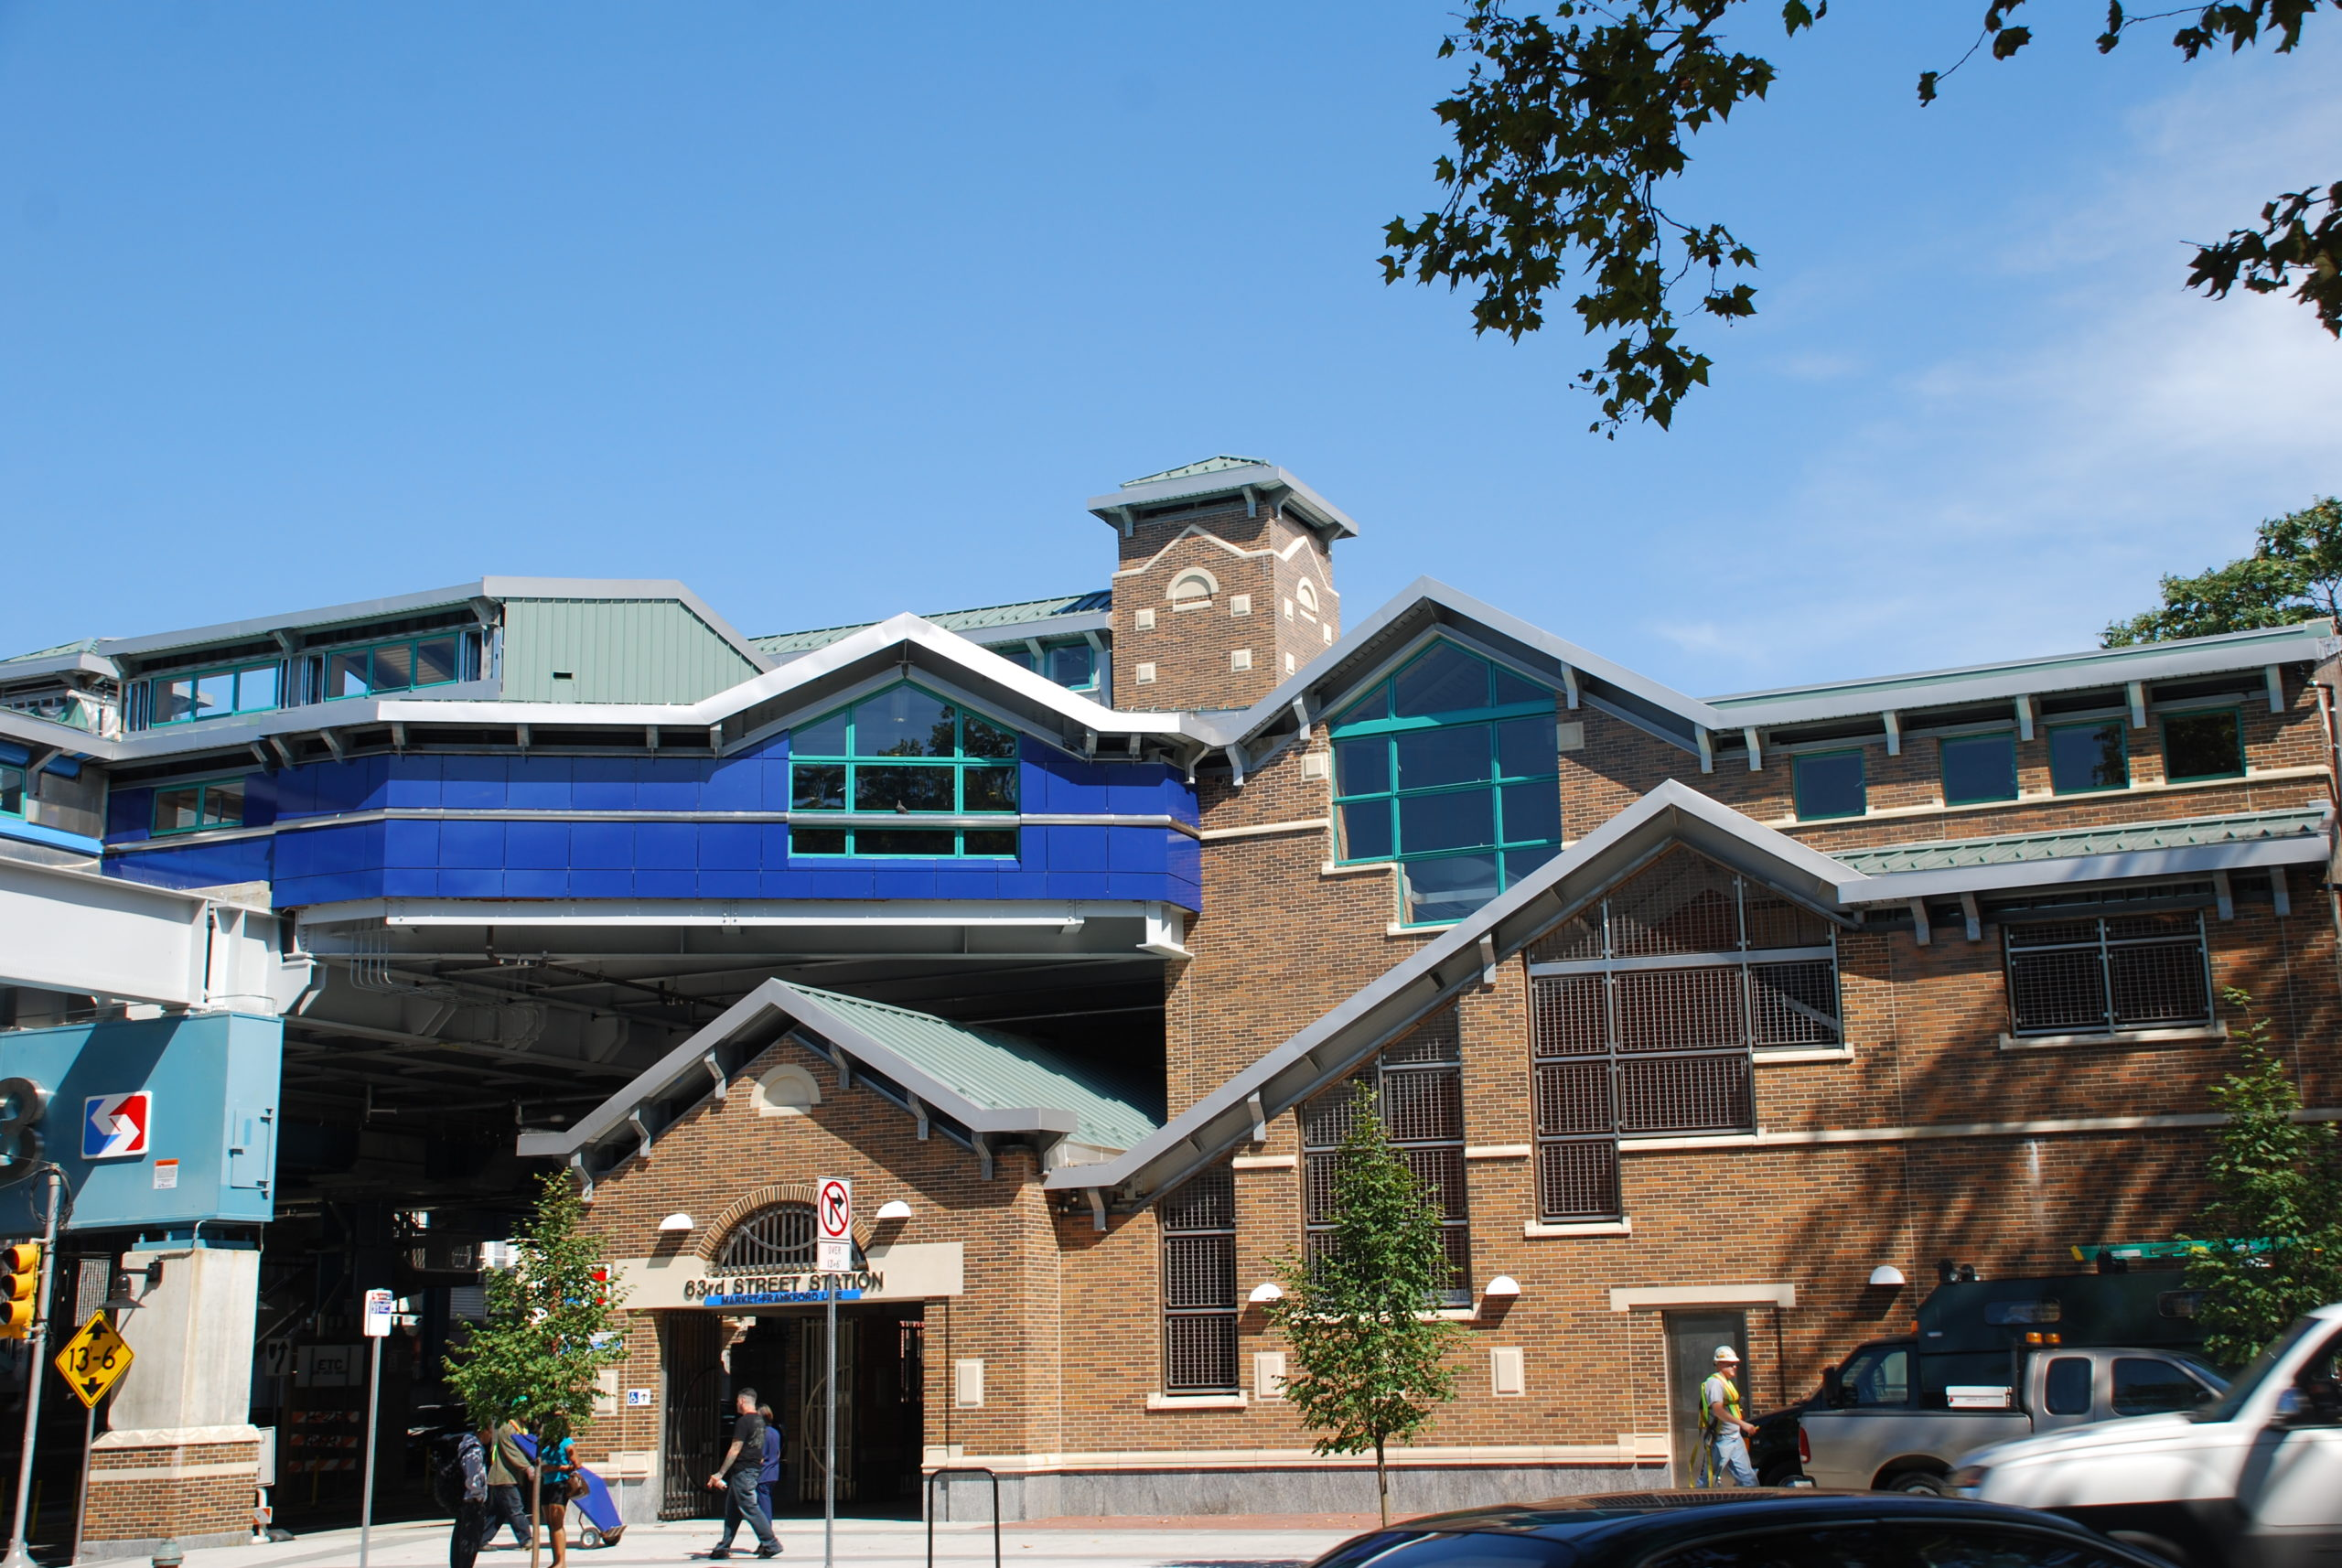 Septa 63rd Street Station